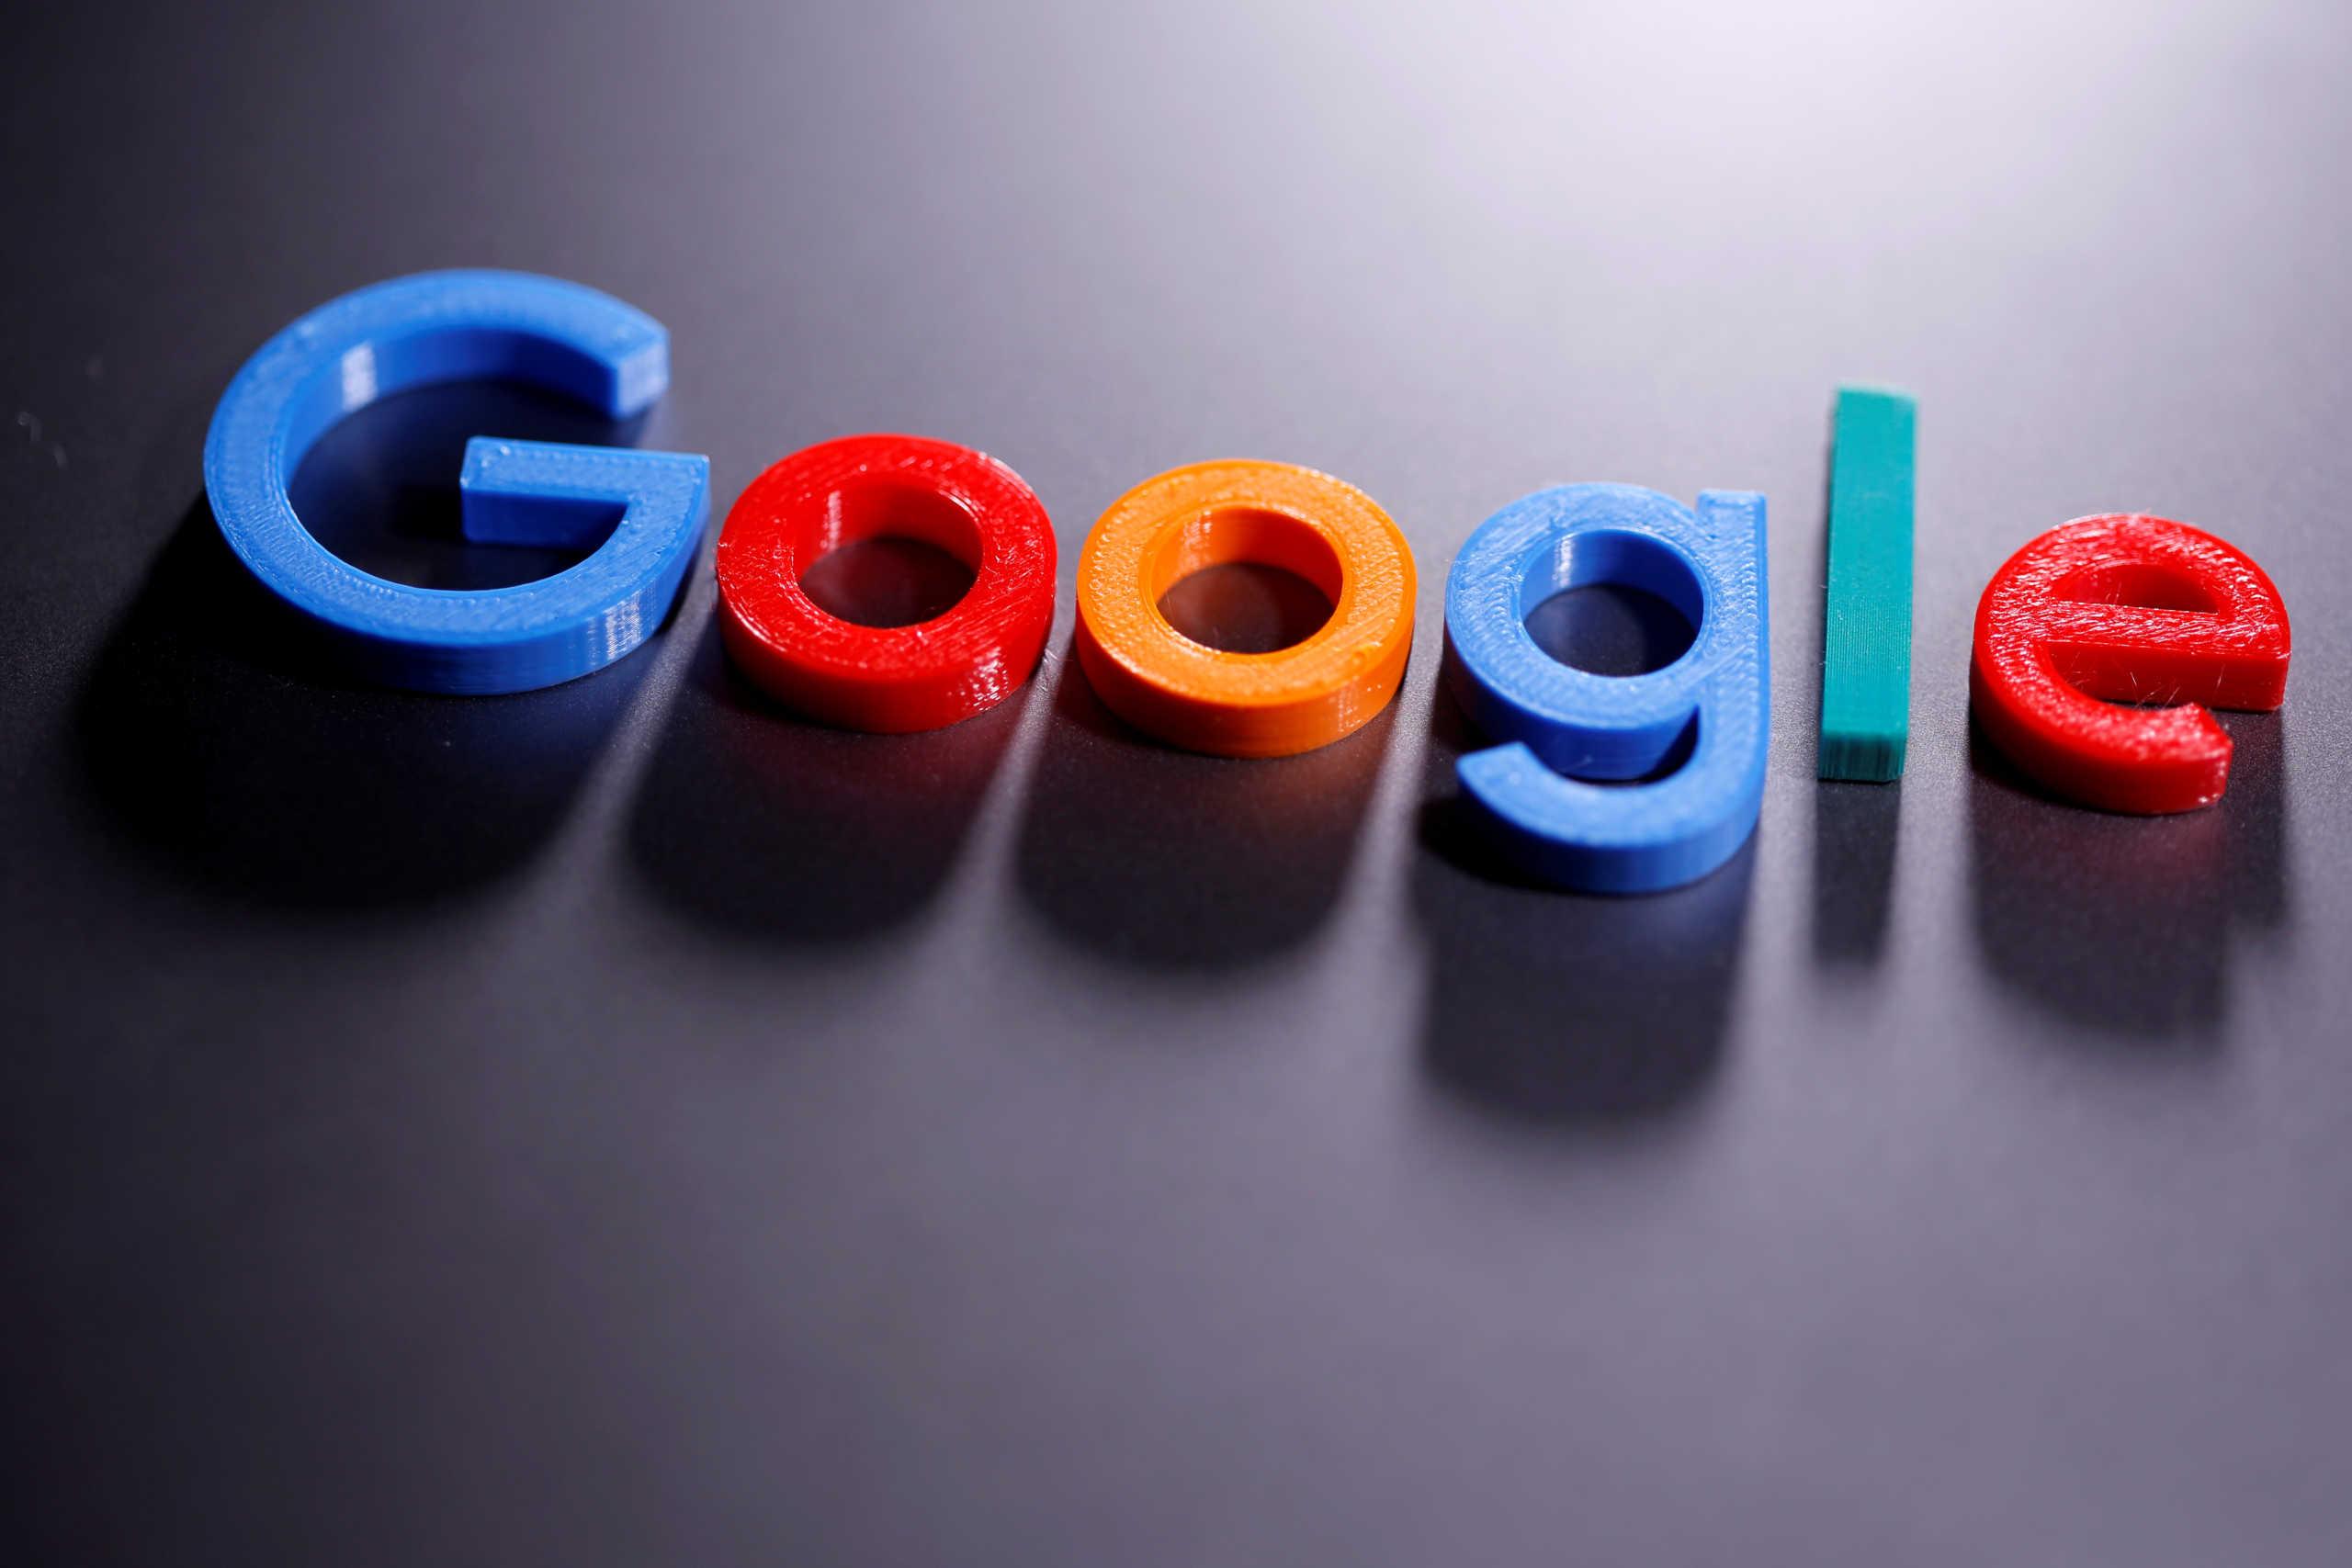 Google: Επενδύει ένα εκατ. δολάρια σε συμπράξεις με δημοσιογραφικούς οργανισμούς